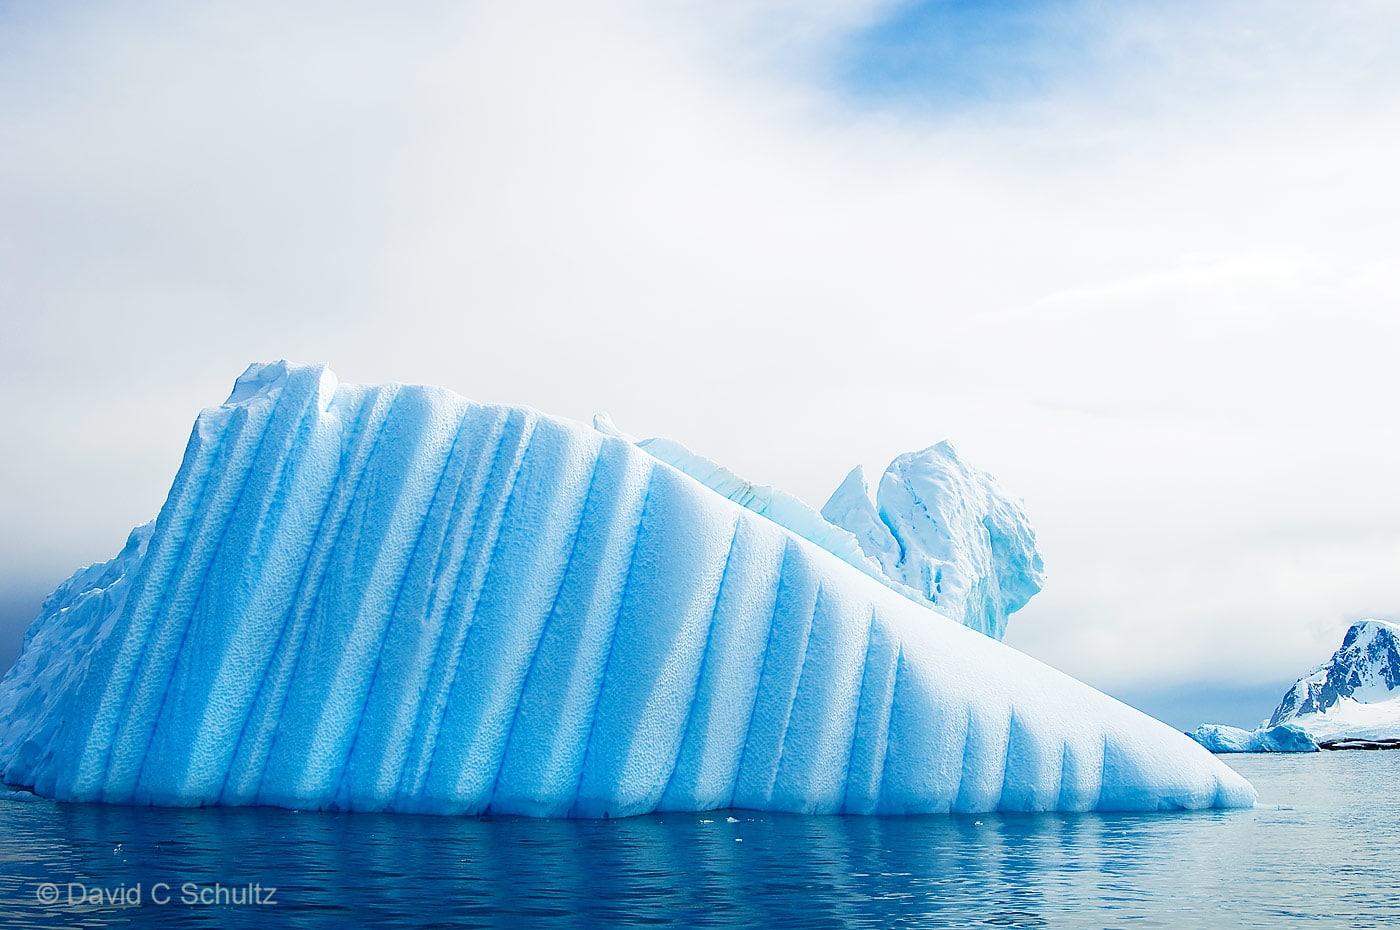 Iceberg in Antarctica - Image #167-476